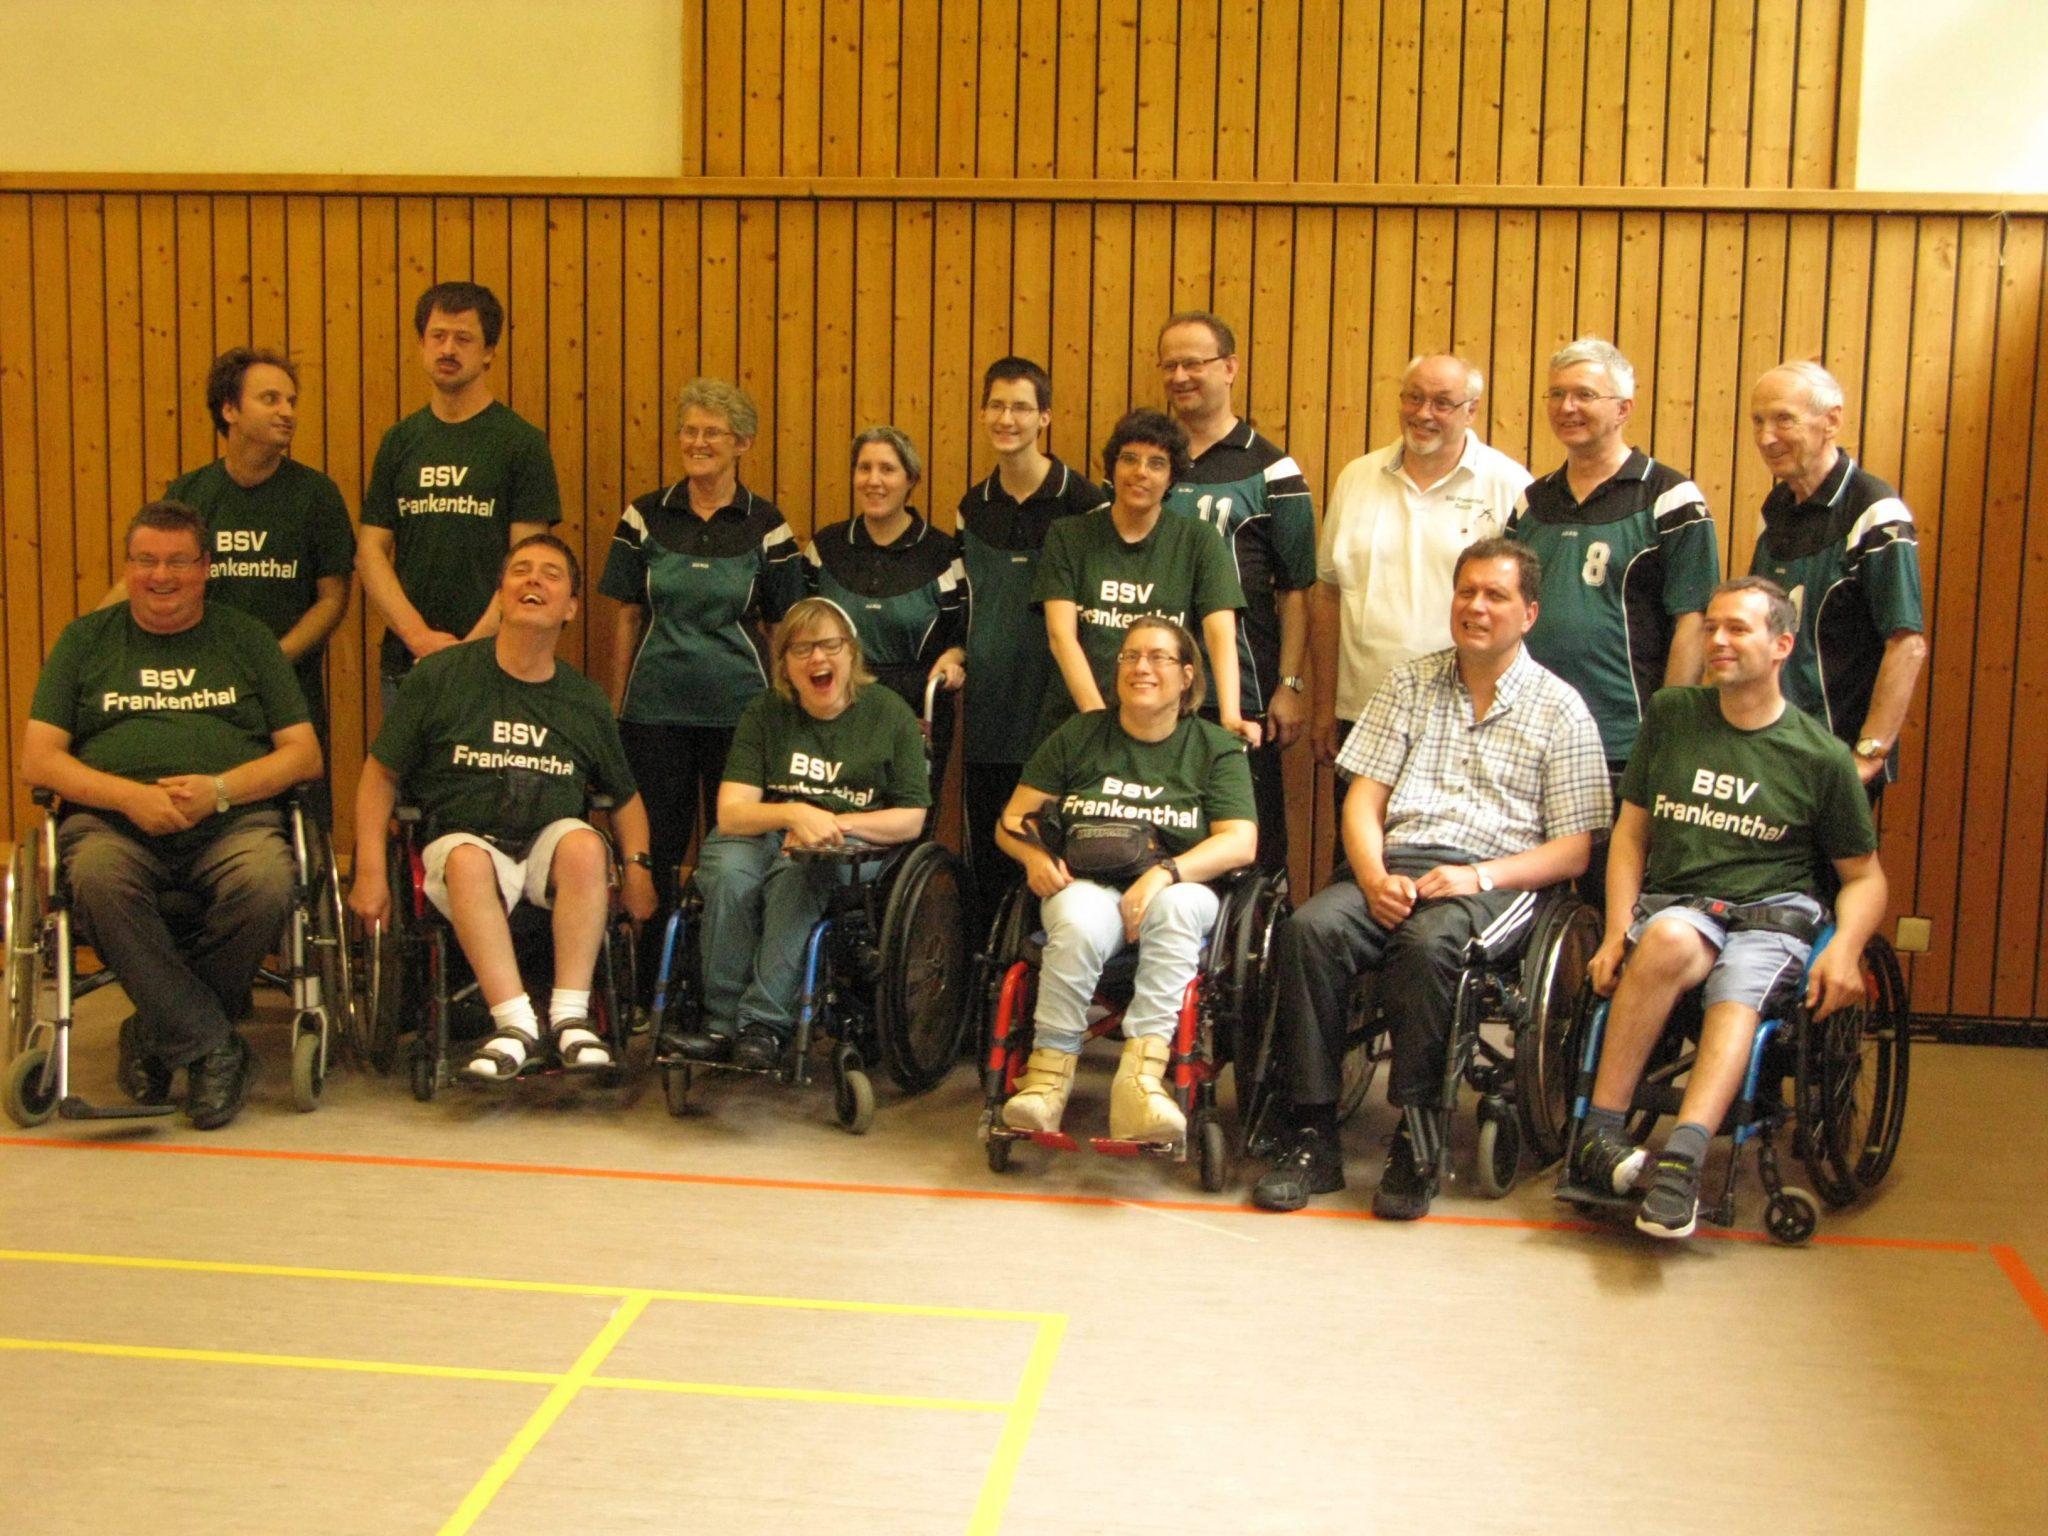 Turnier Pirmasens 2016